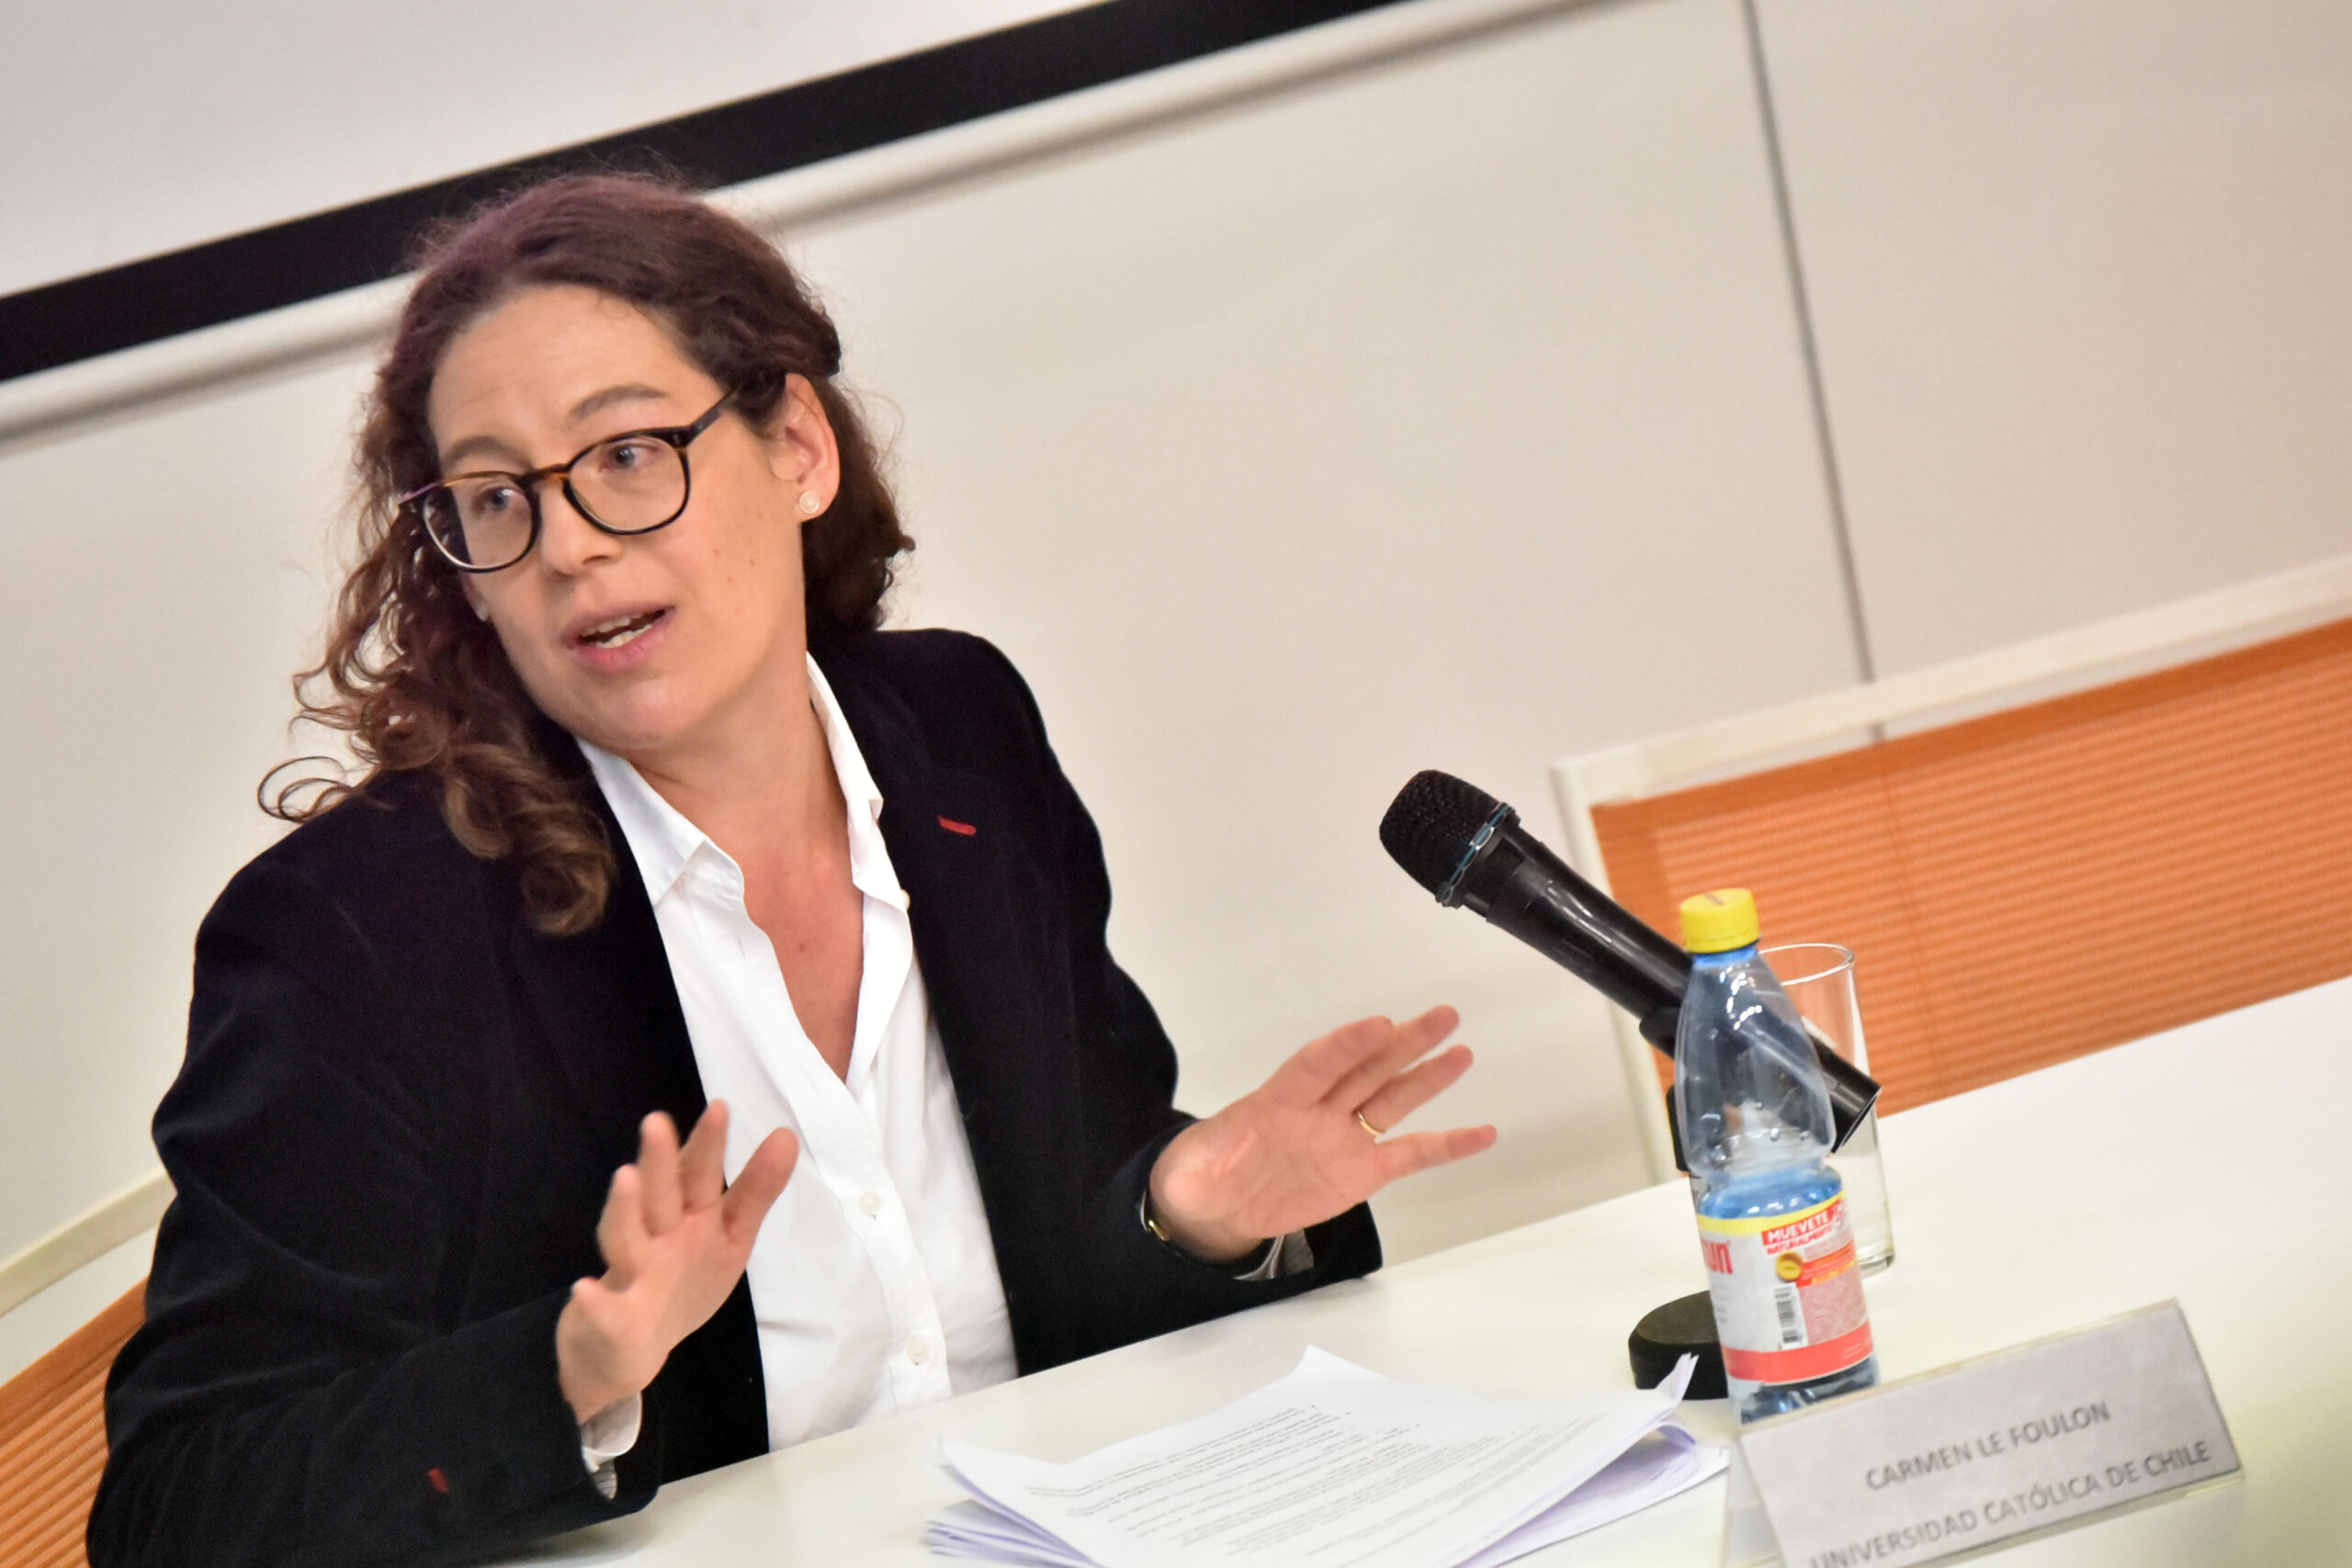 Carmen Le Foulon da contexto a la última entrega de la encuesta CEP